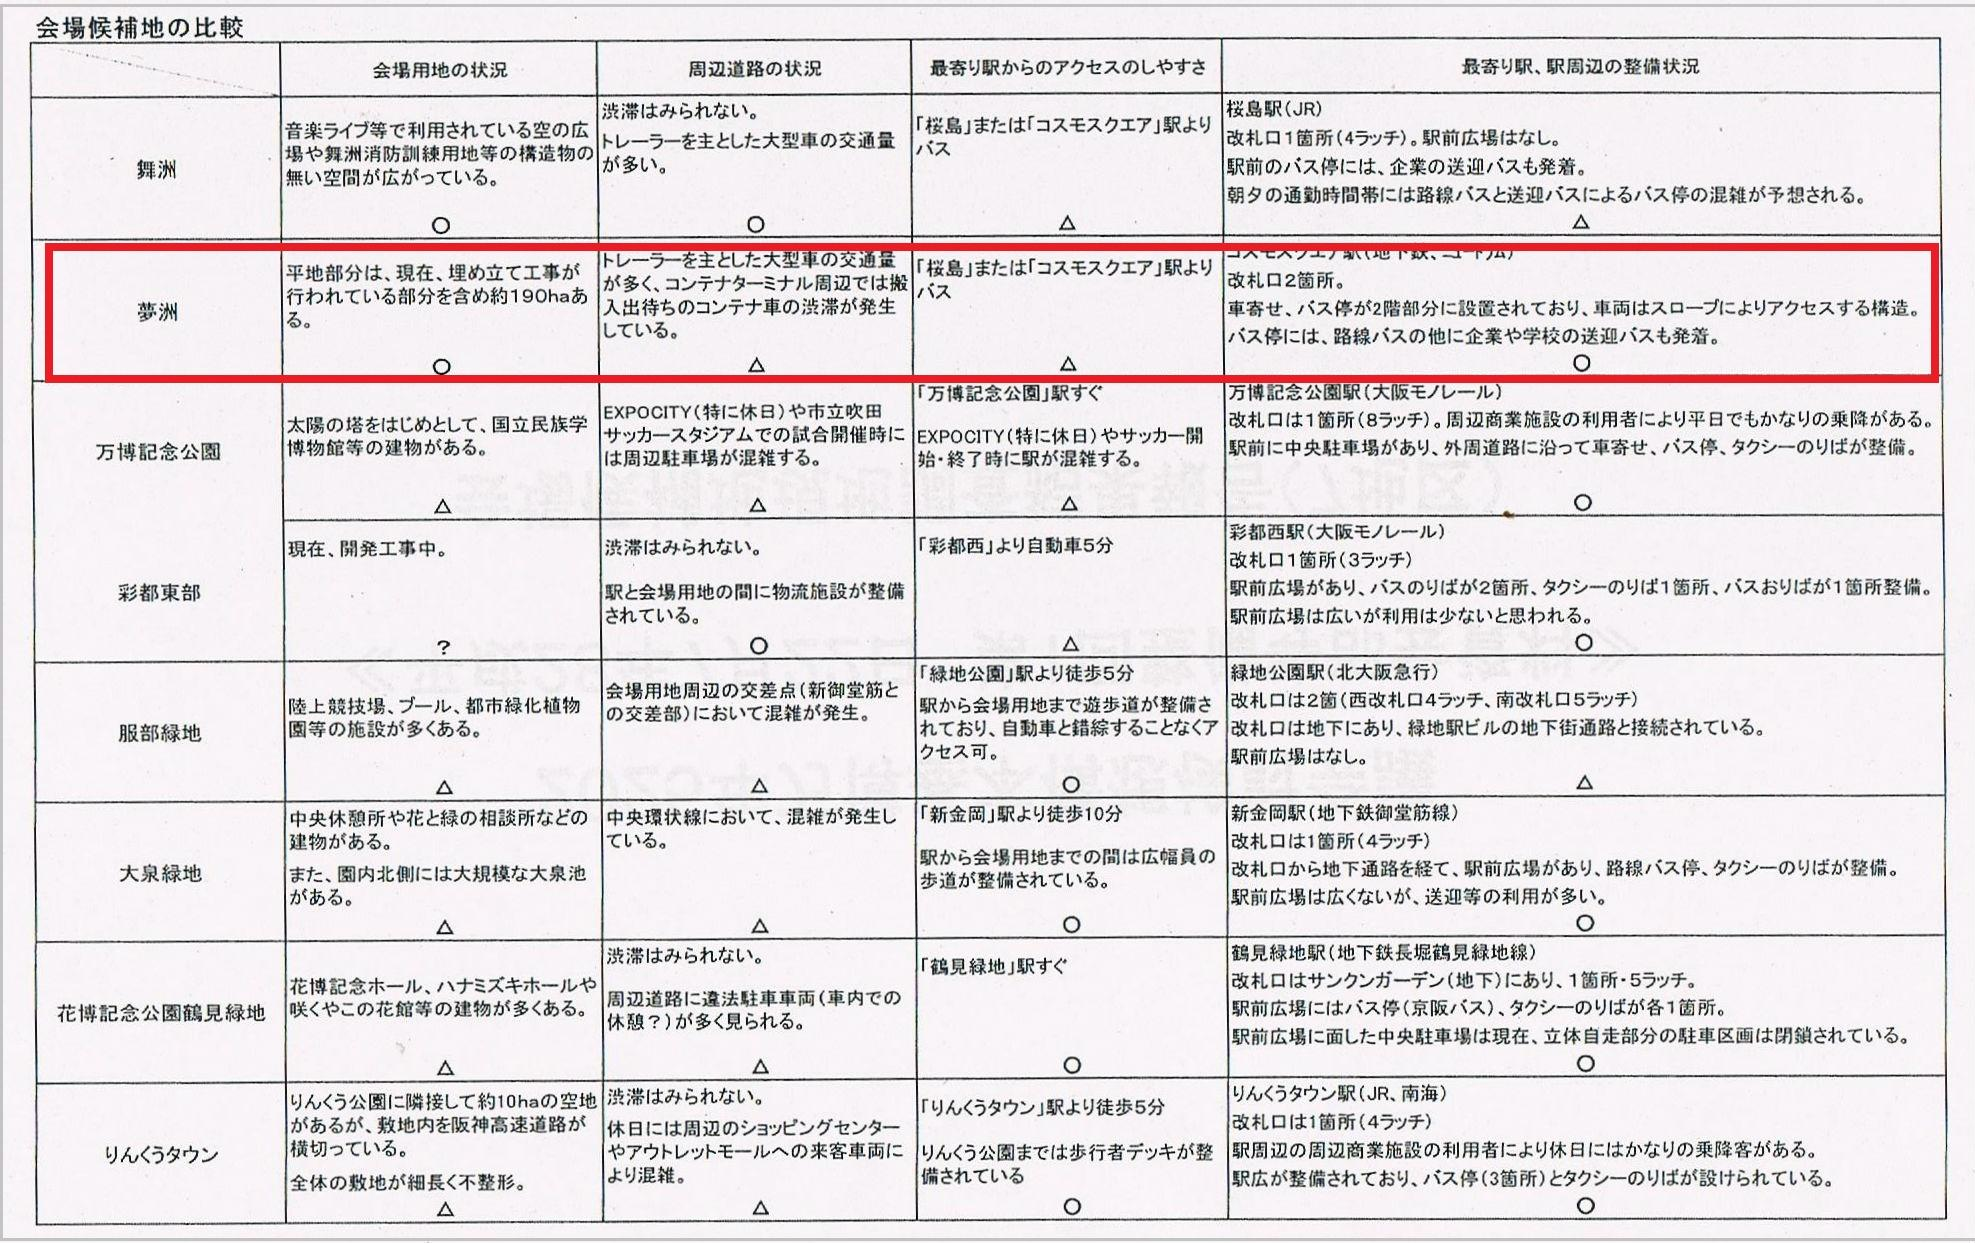 http://hunter-investigate.jp/news/9d38eab8597041199b5fcce5ce09700e4f8d534c.jpg